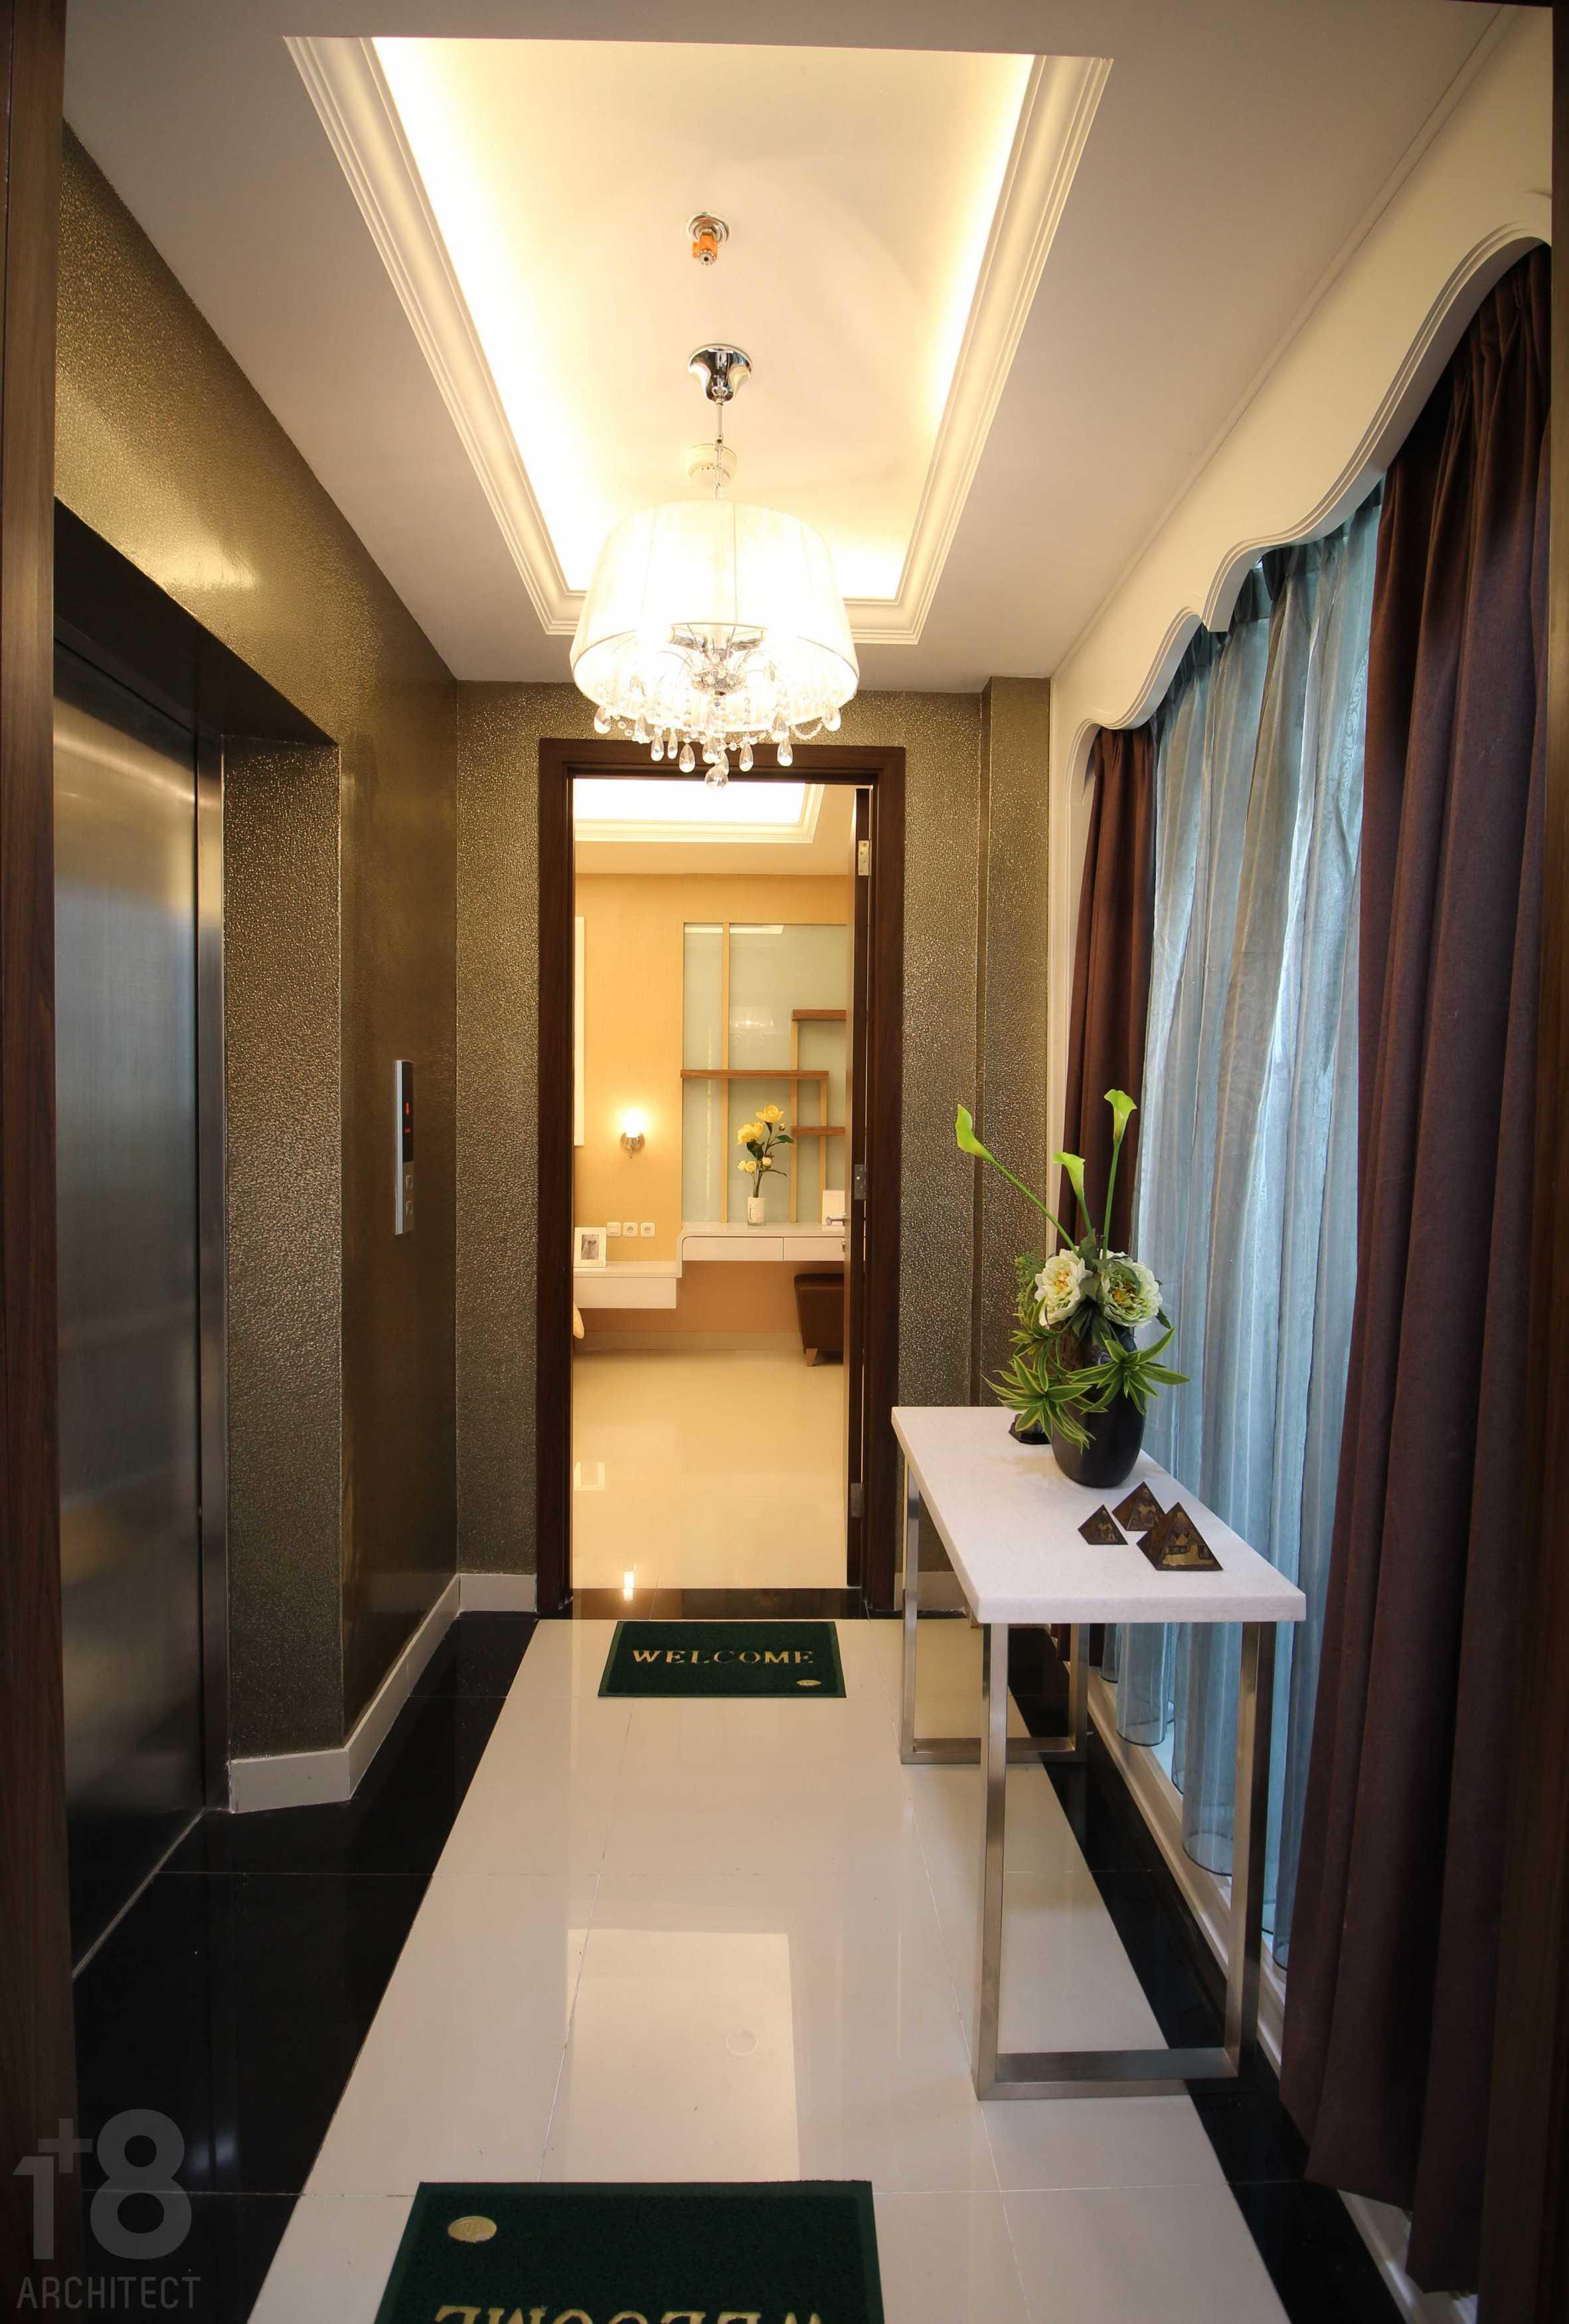 1+8 Architect St. Moritz, Presidential Tower Suite Room Jakarta, Indonesia Jakarta, Indonesia Corridor Modern  23006